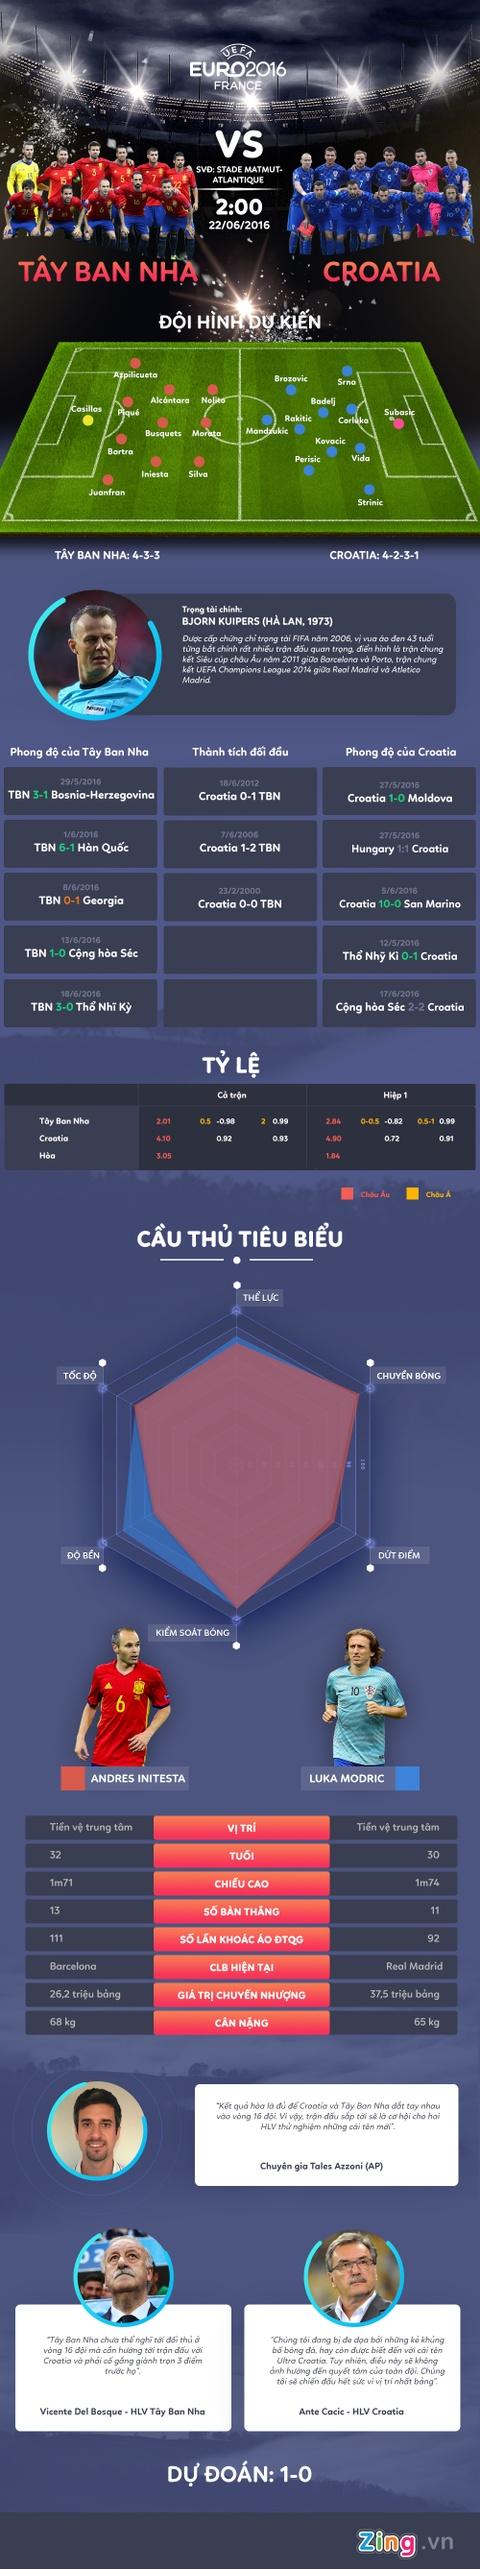 Tay Ban Nha vs Croatia: Khong khoan nhuong hinh anh 1